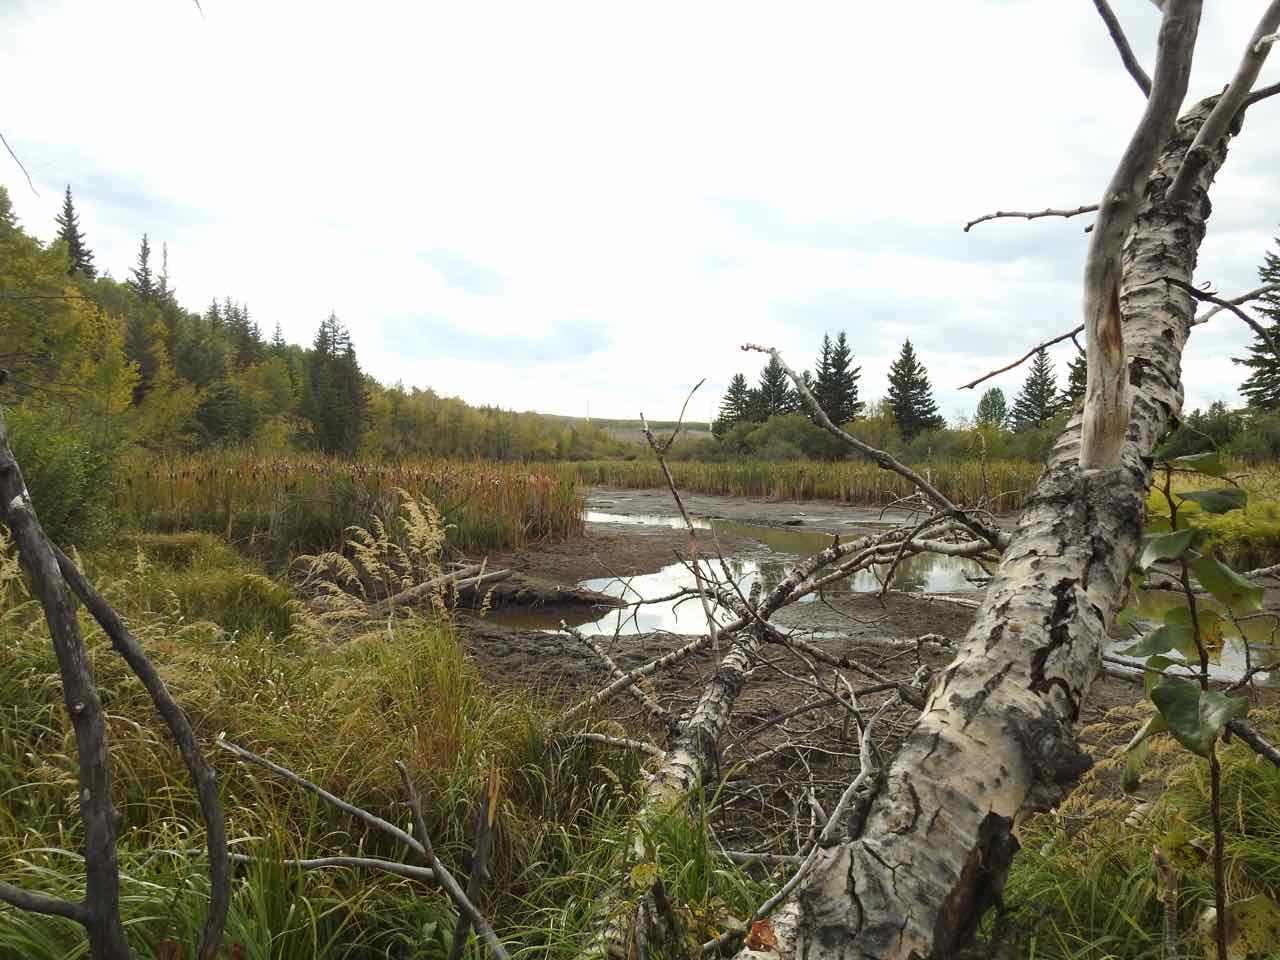 -Beaver_Pond-East_End-Beaver_Seeking_To_Dam_Further_Upstream_ON_WC01-Tree_Fall_B3_Sept_16_2017.jpg